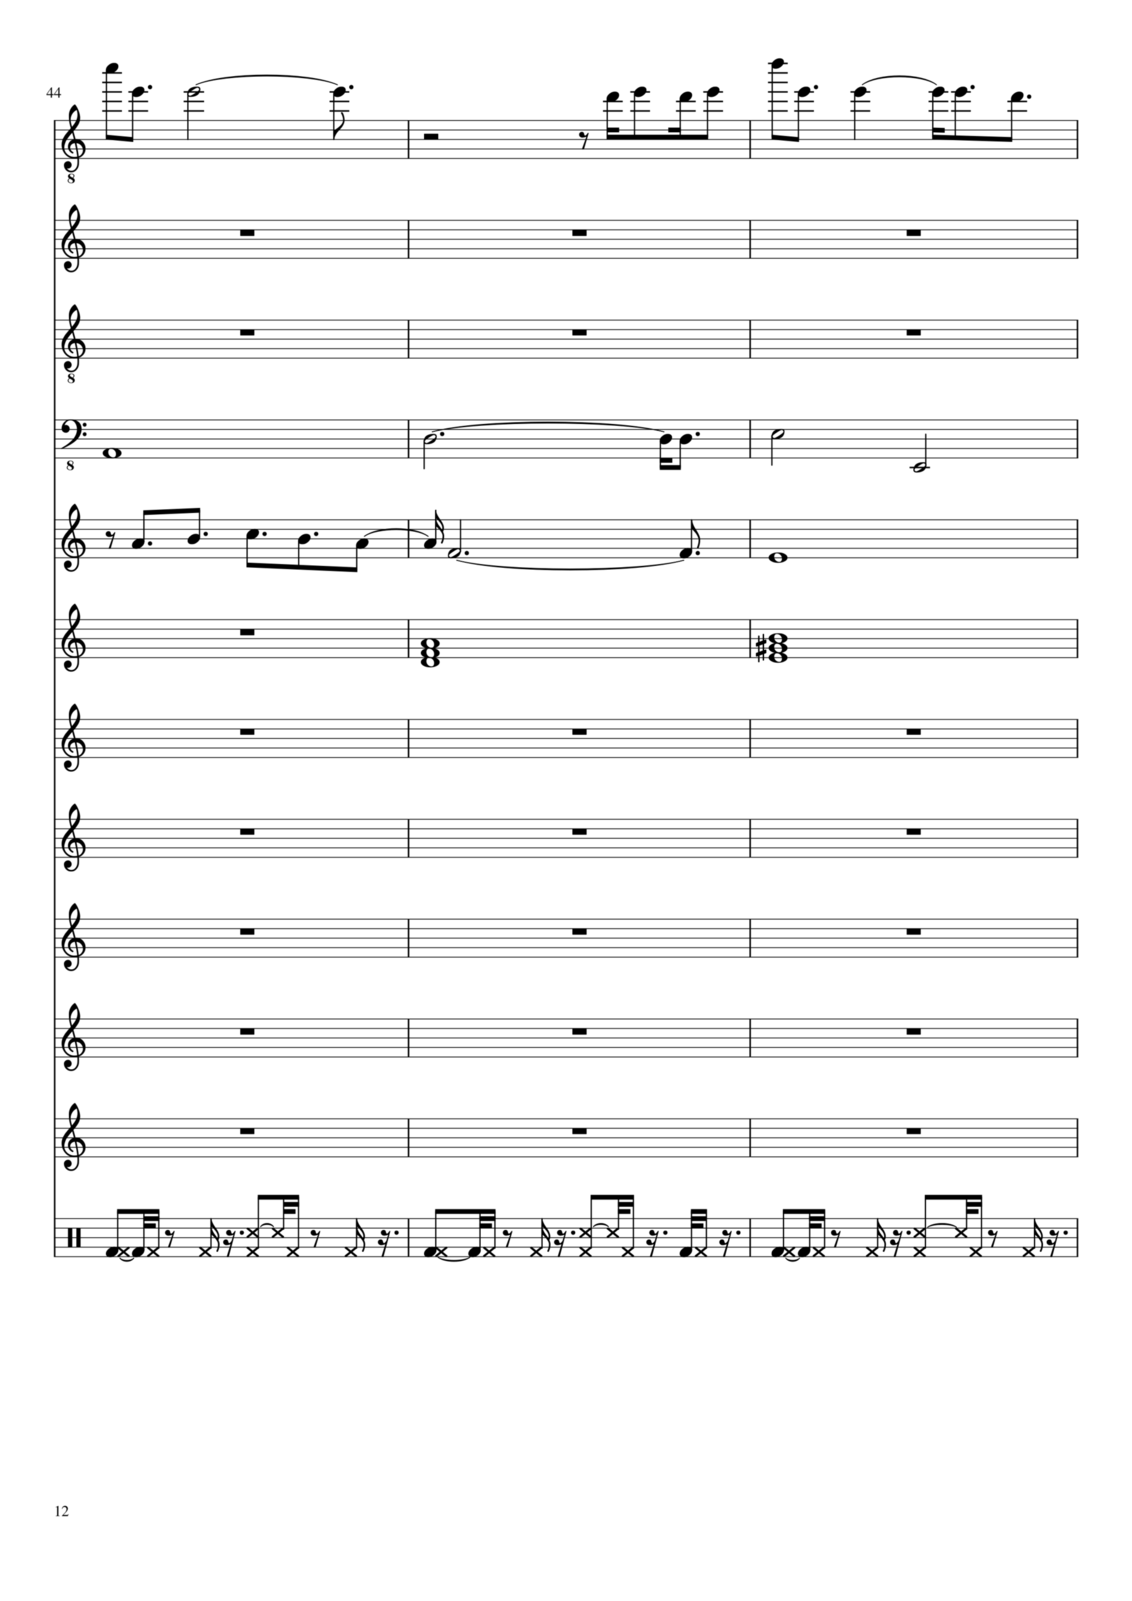 Prosti slide, Image 12